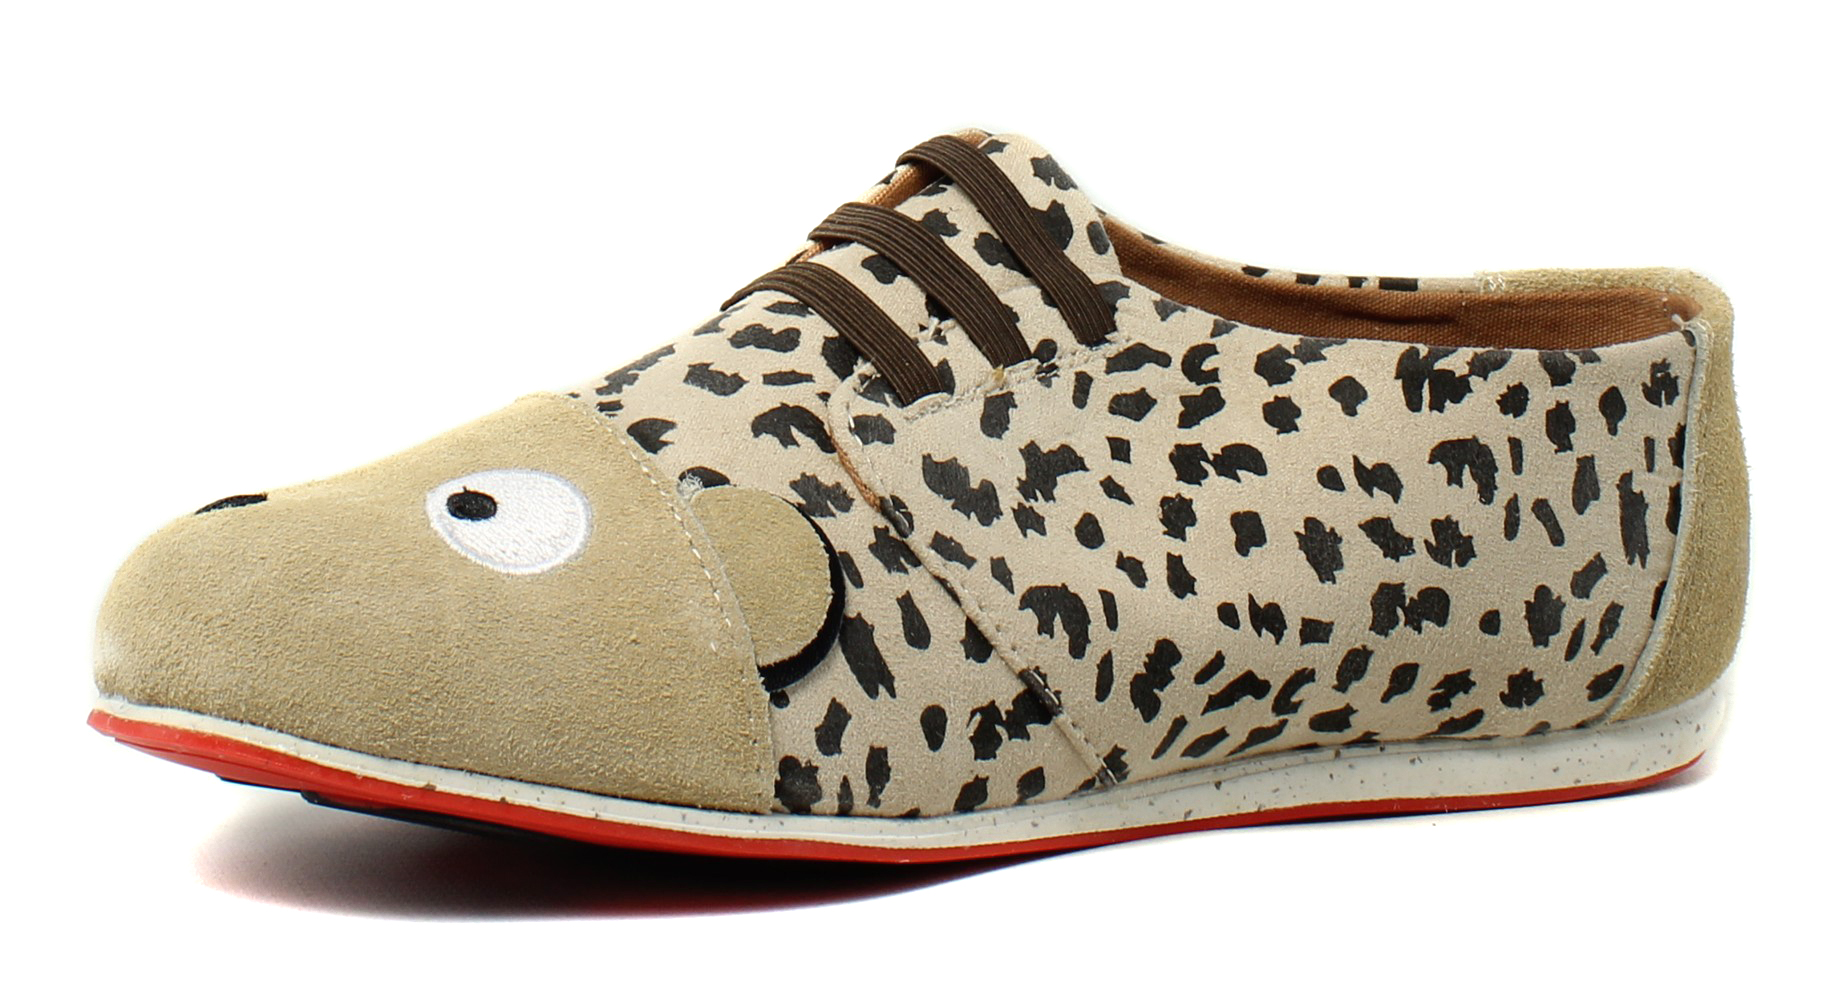 New Emu Womens Cheetah Caramel Fashion Shoes Size 4